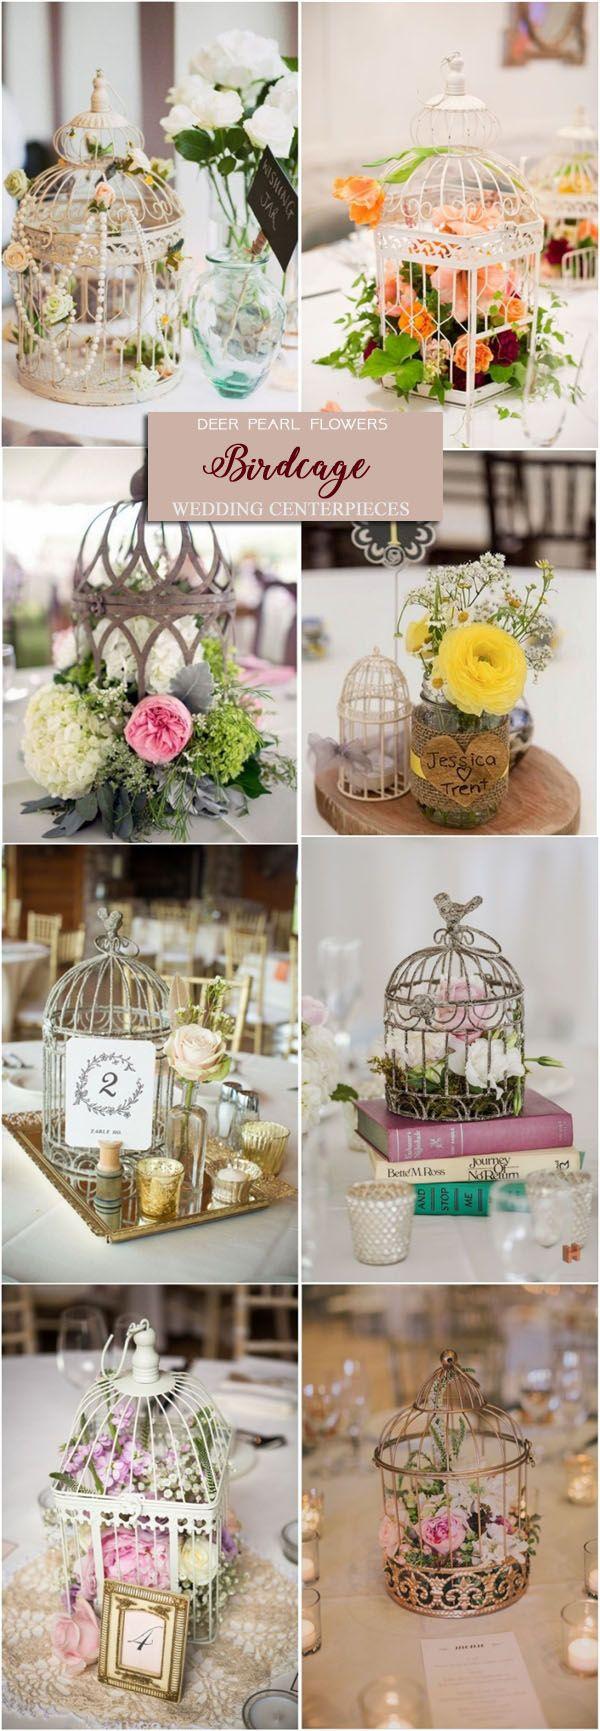 Vintage birdcage wedding centerpiece ideas / http://www.deerpearlflowers.com/wedding-centerpiece-ideas/2/